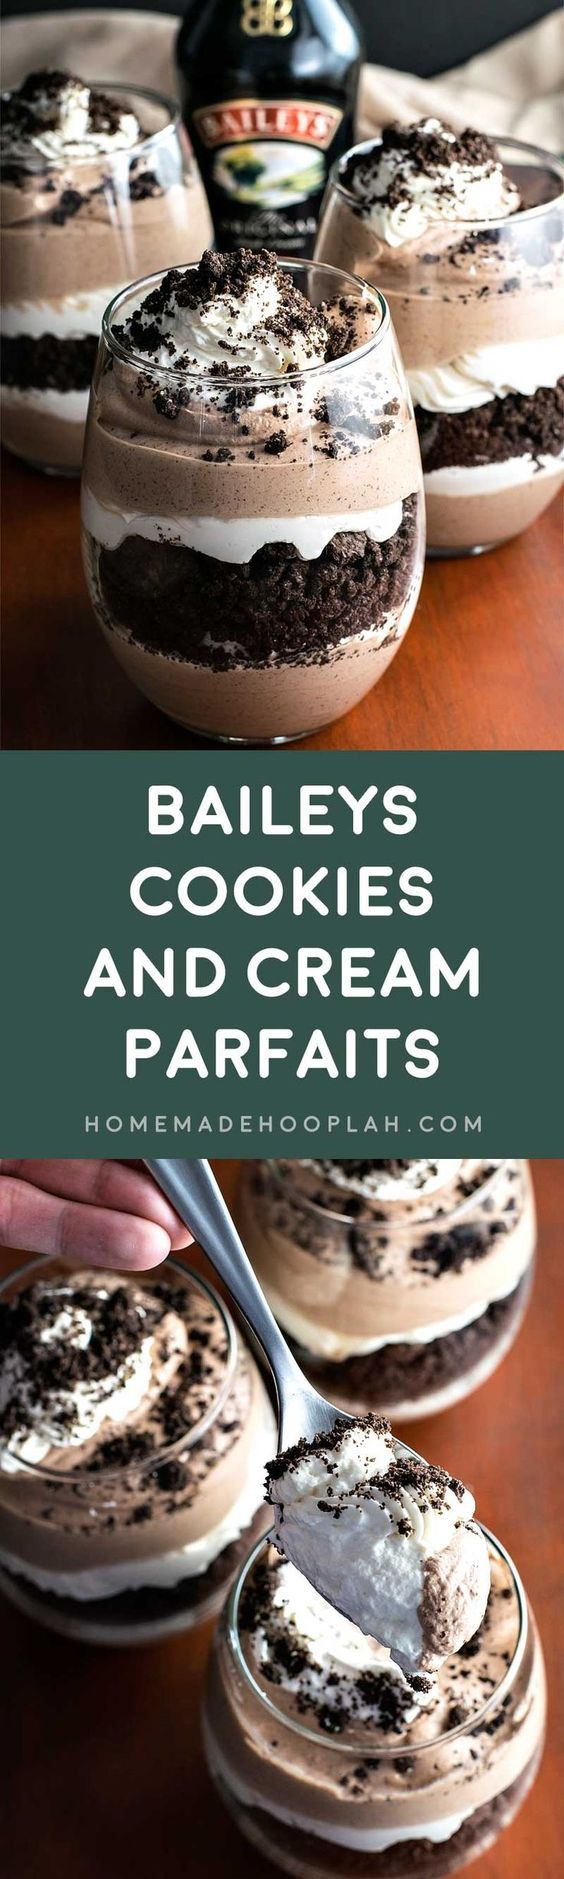 Bailey's Cookies and Cream Parfaits